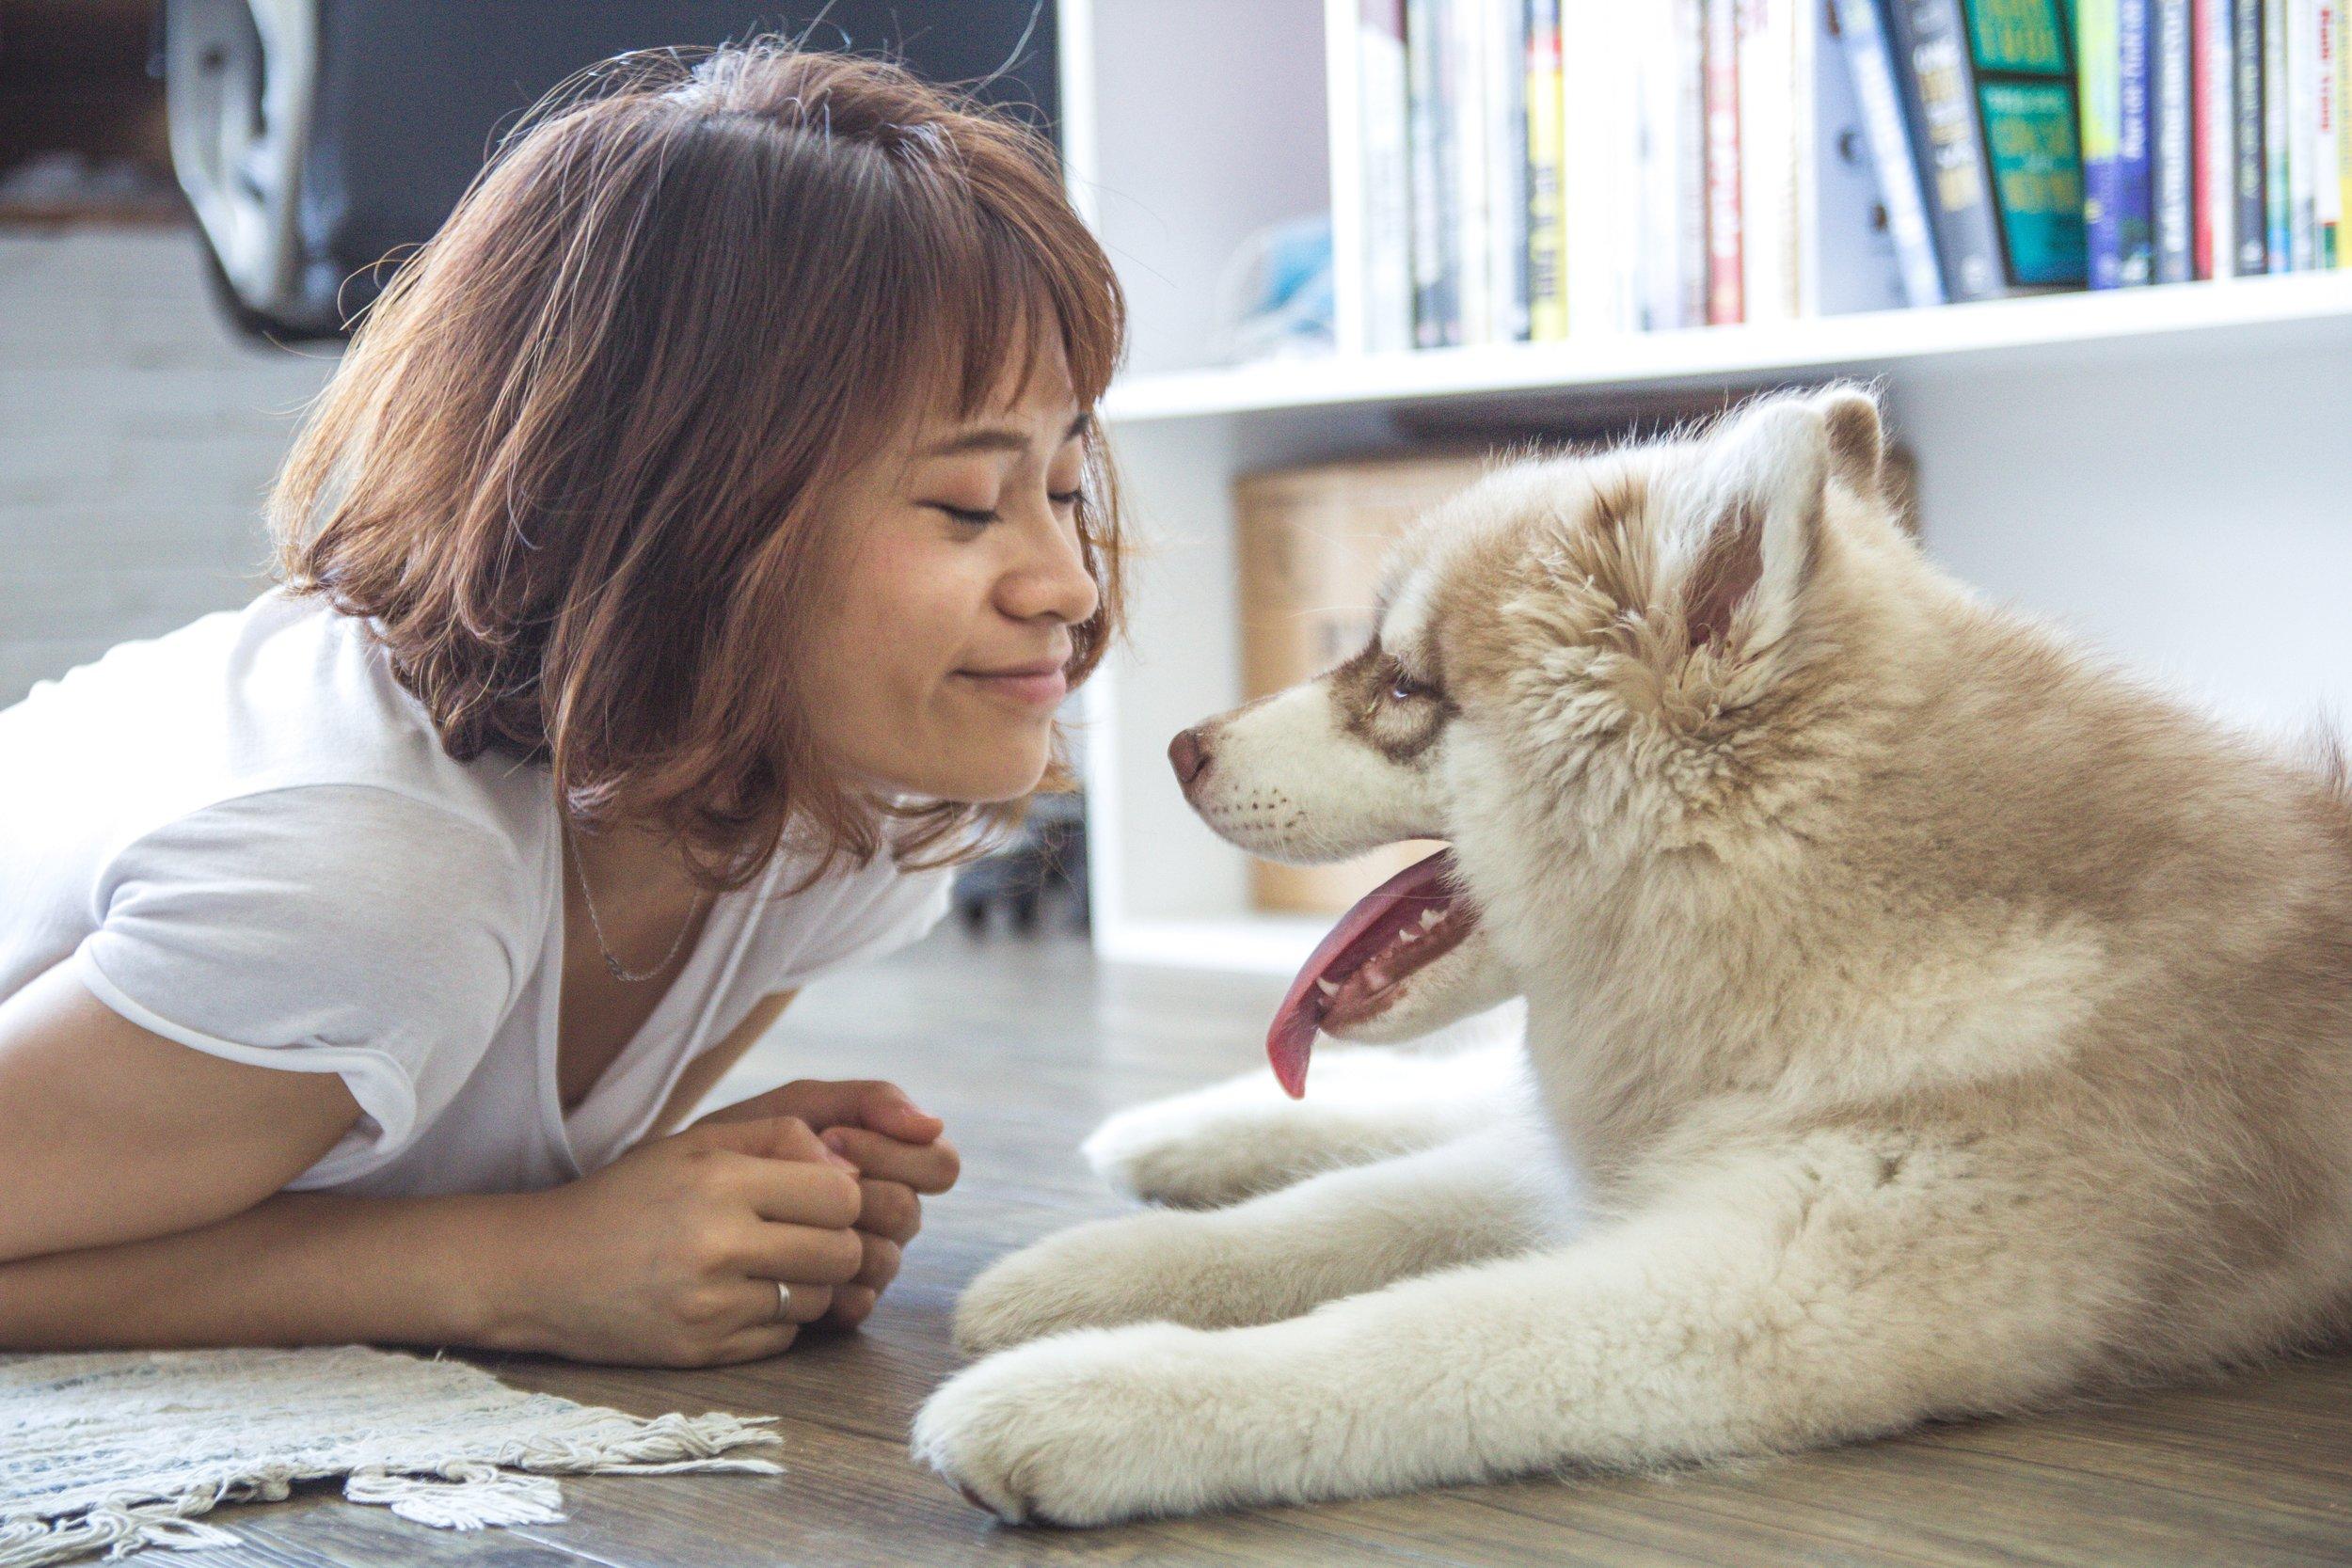 animal-dog-feelings-40064.jpg